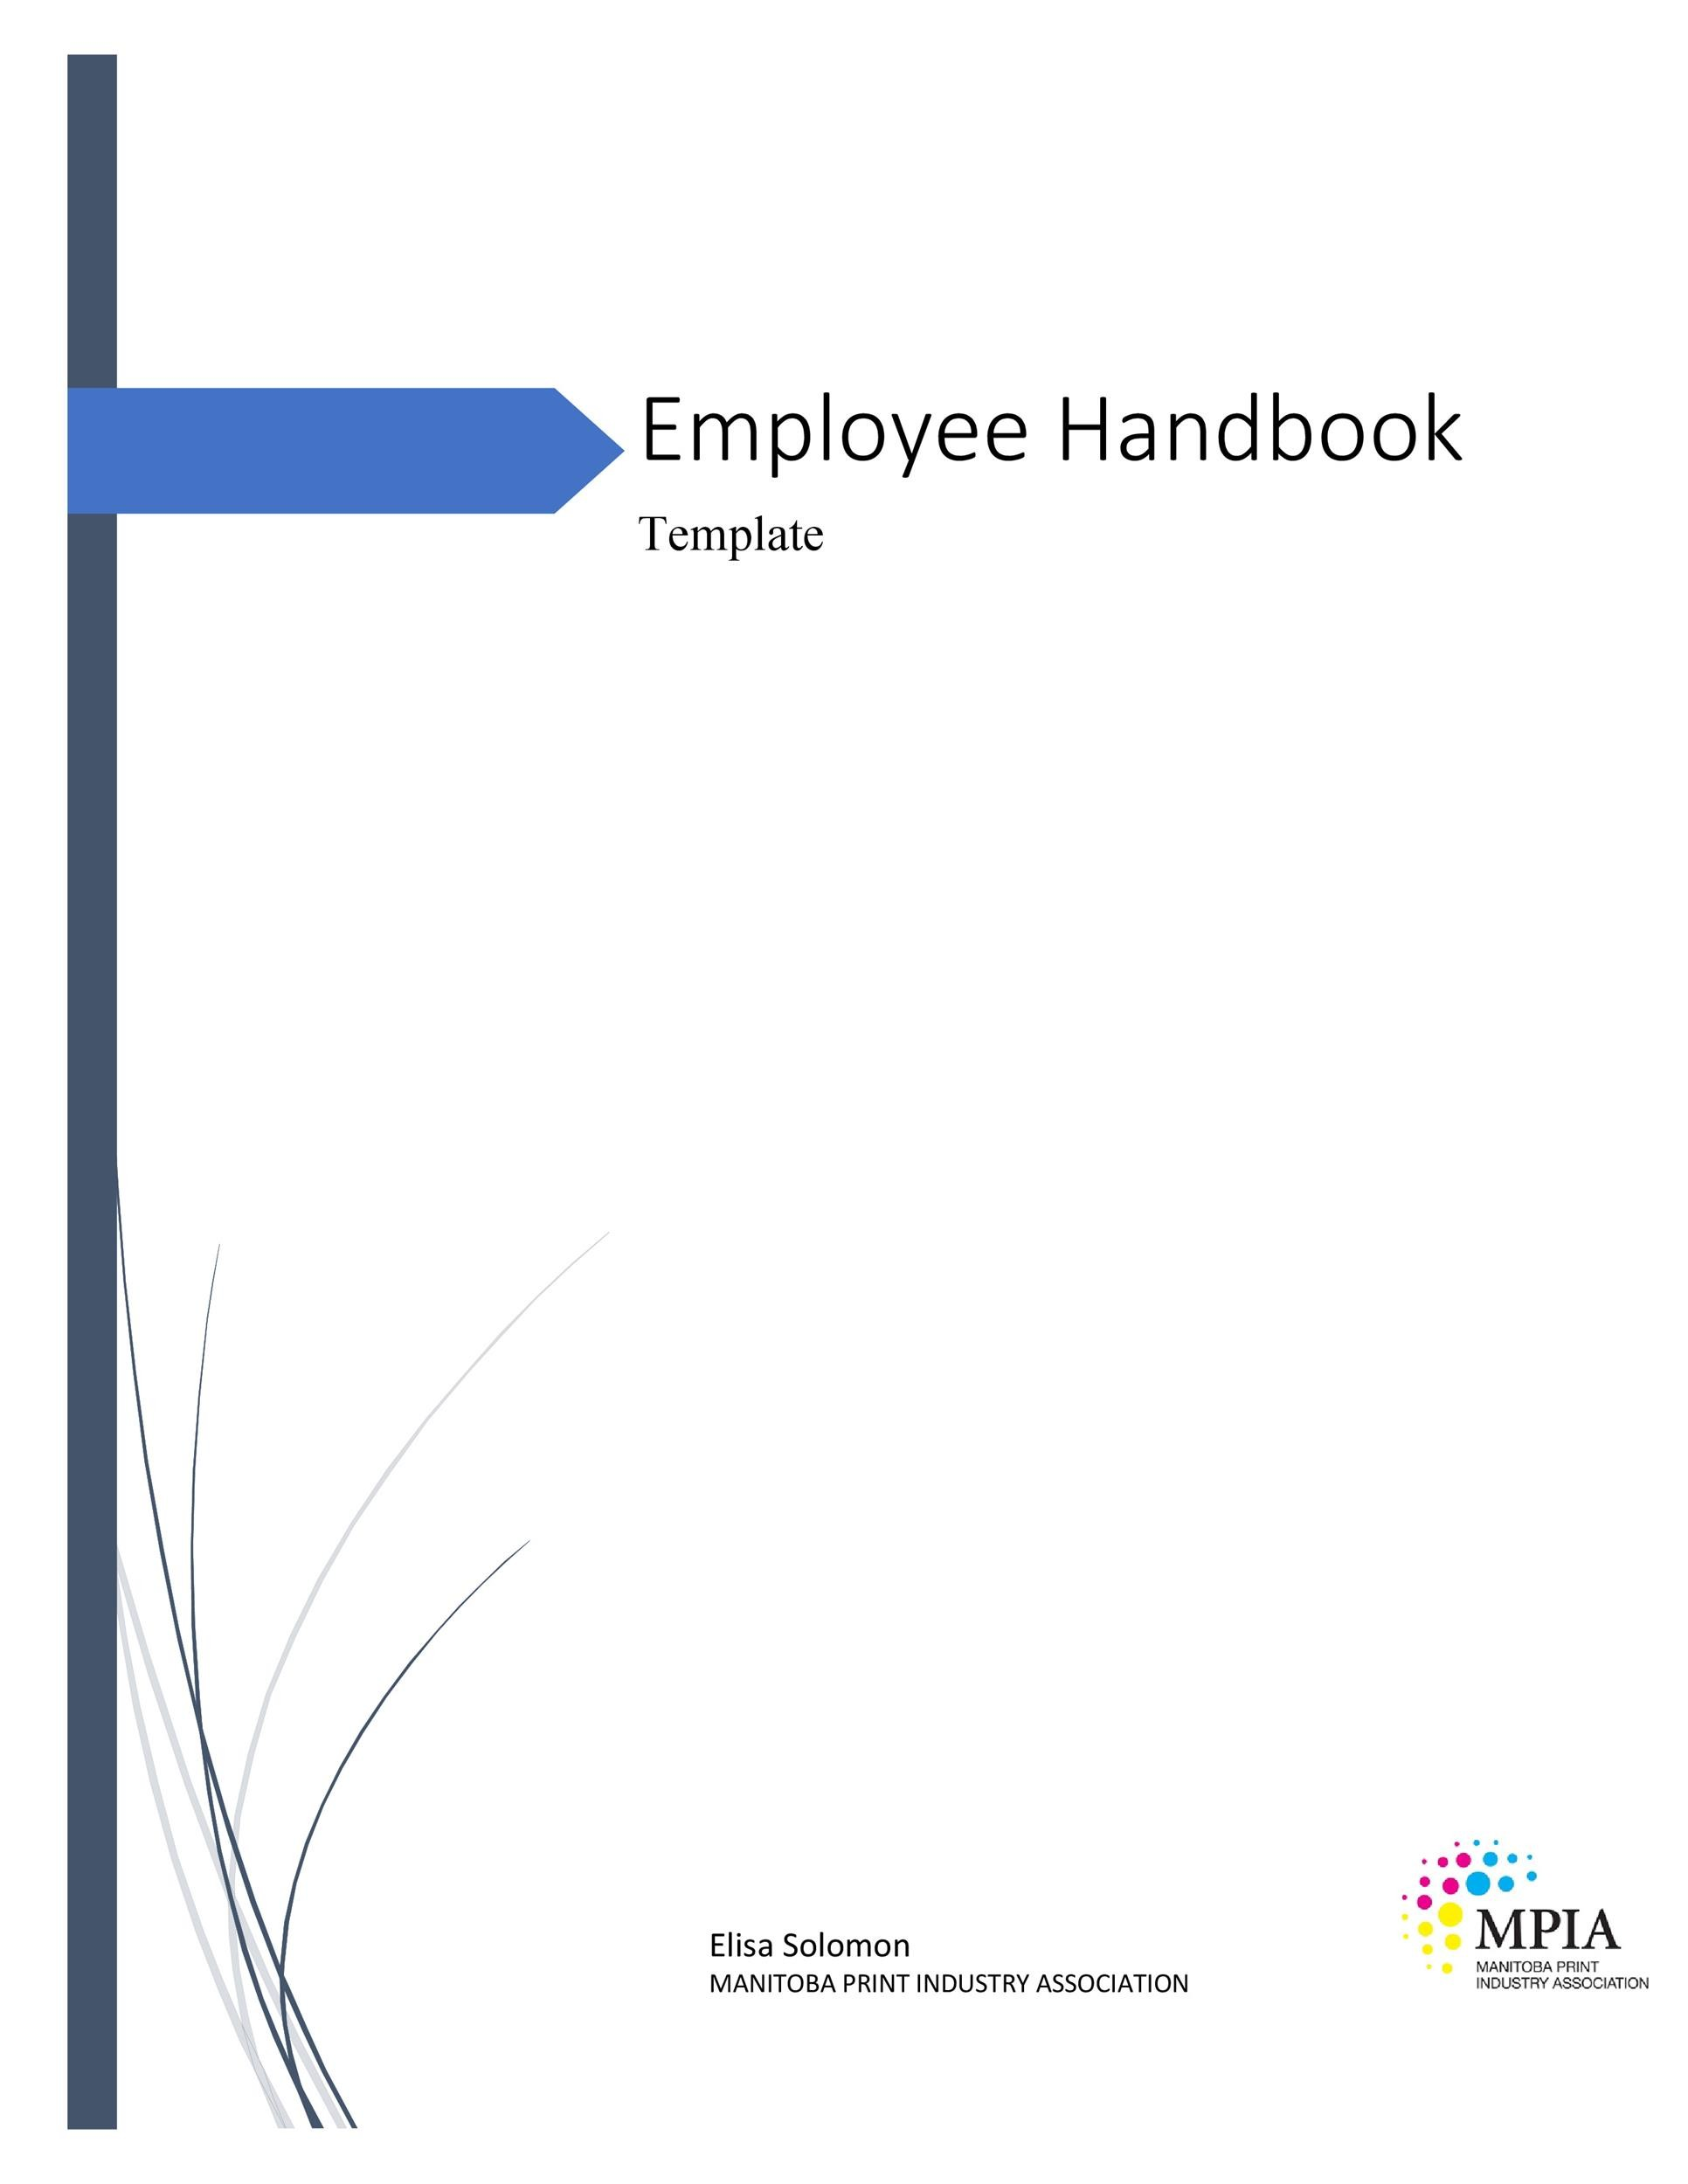 Free employee handbook template 19